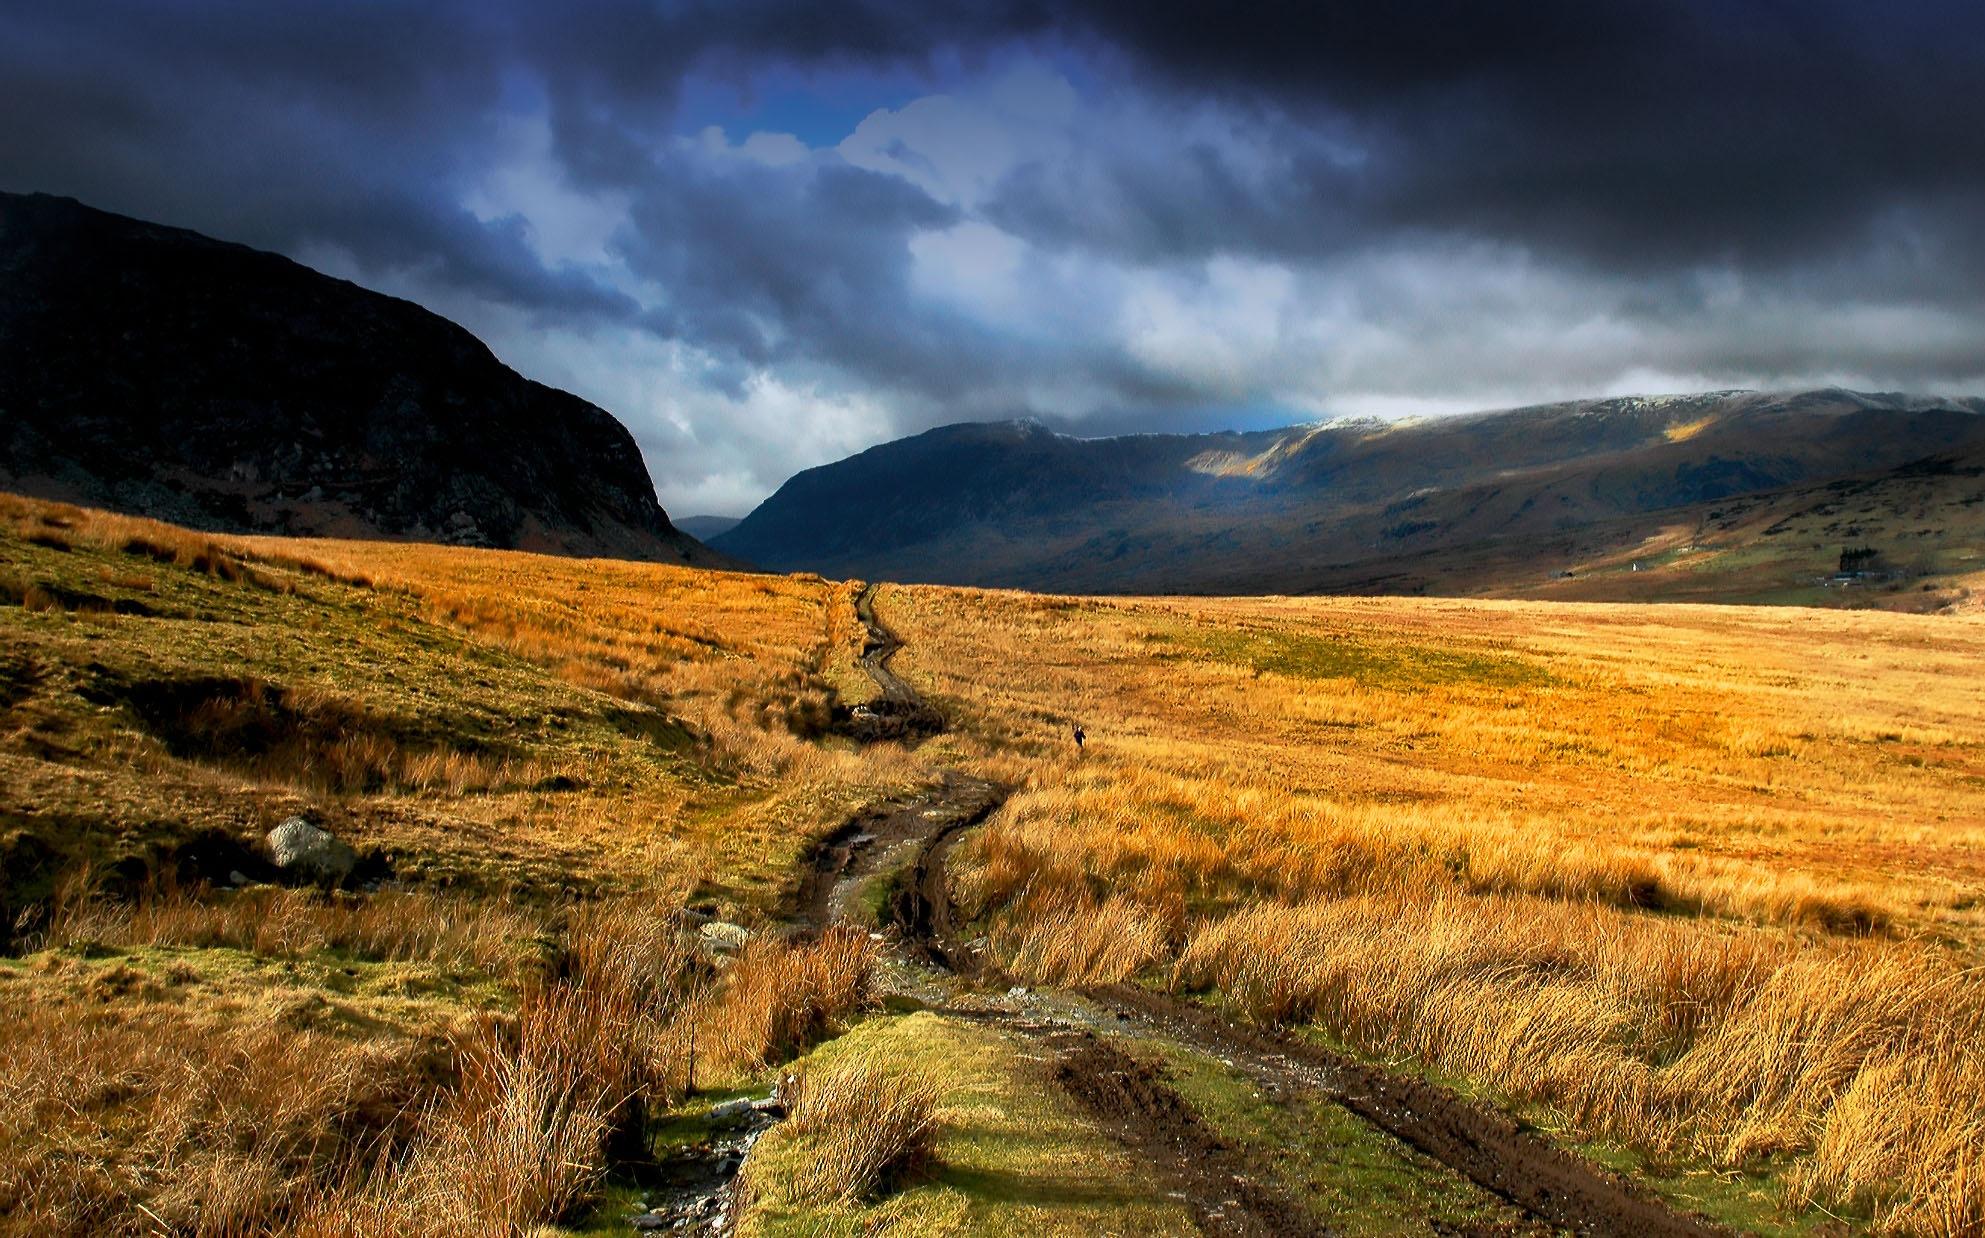 Long Way to Go (Hope it doesn't rain) by John Roberts